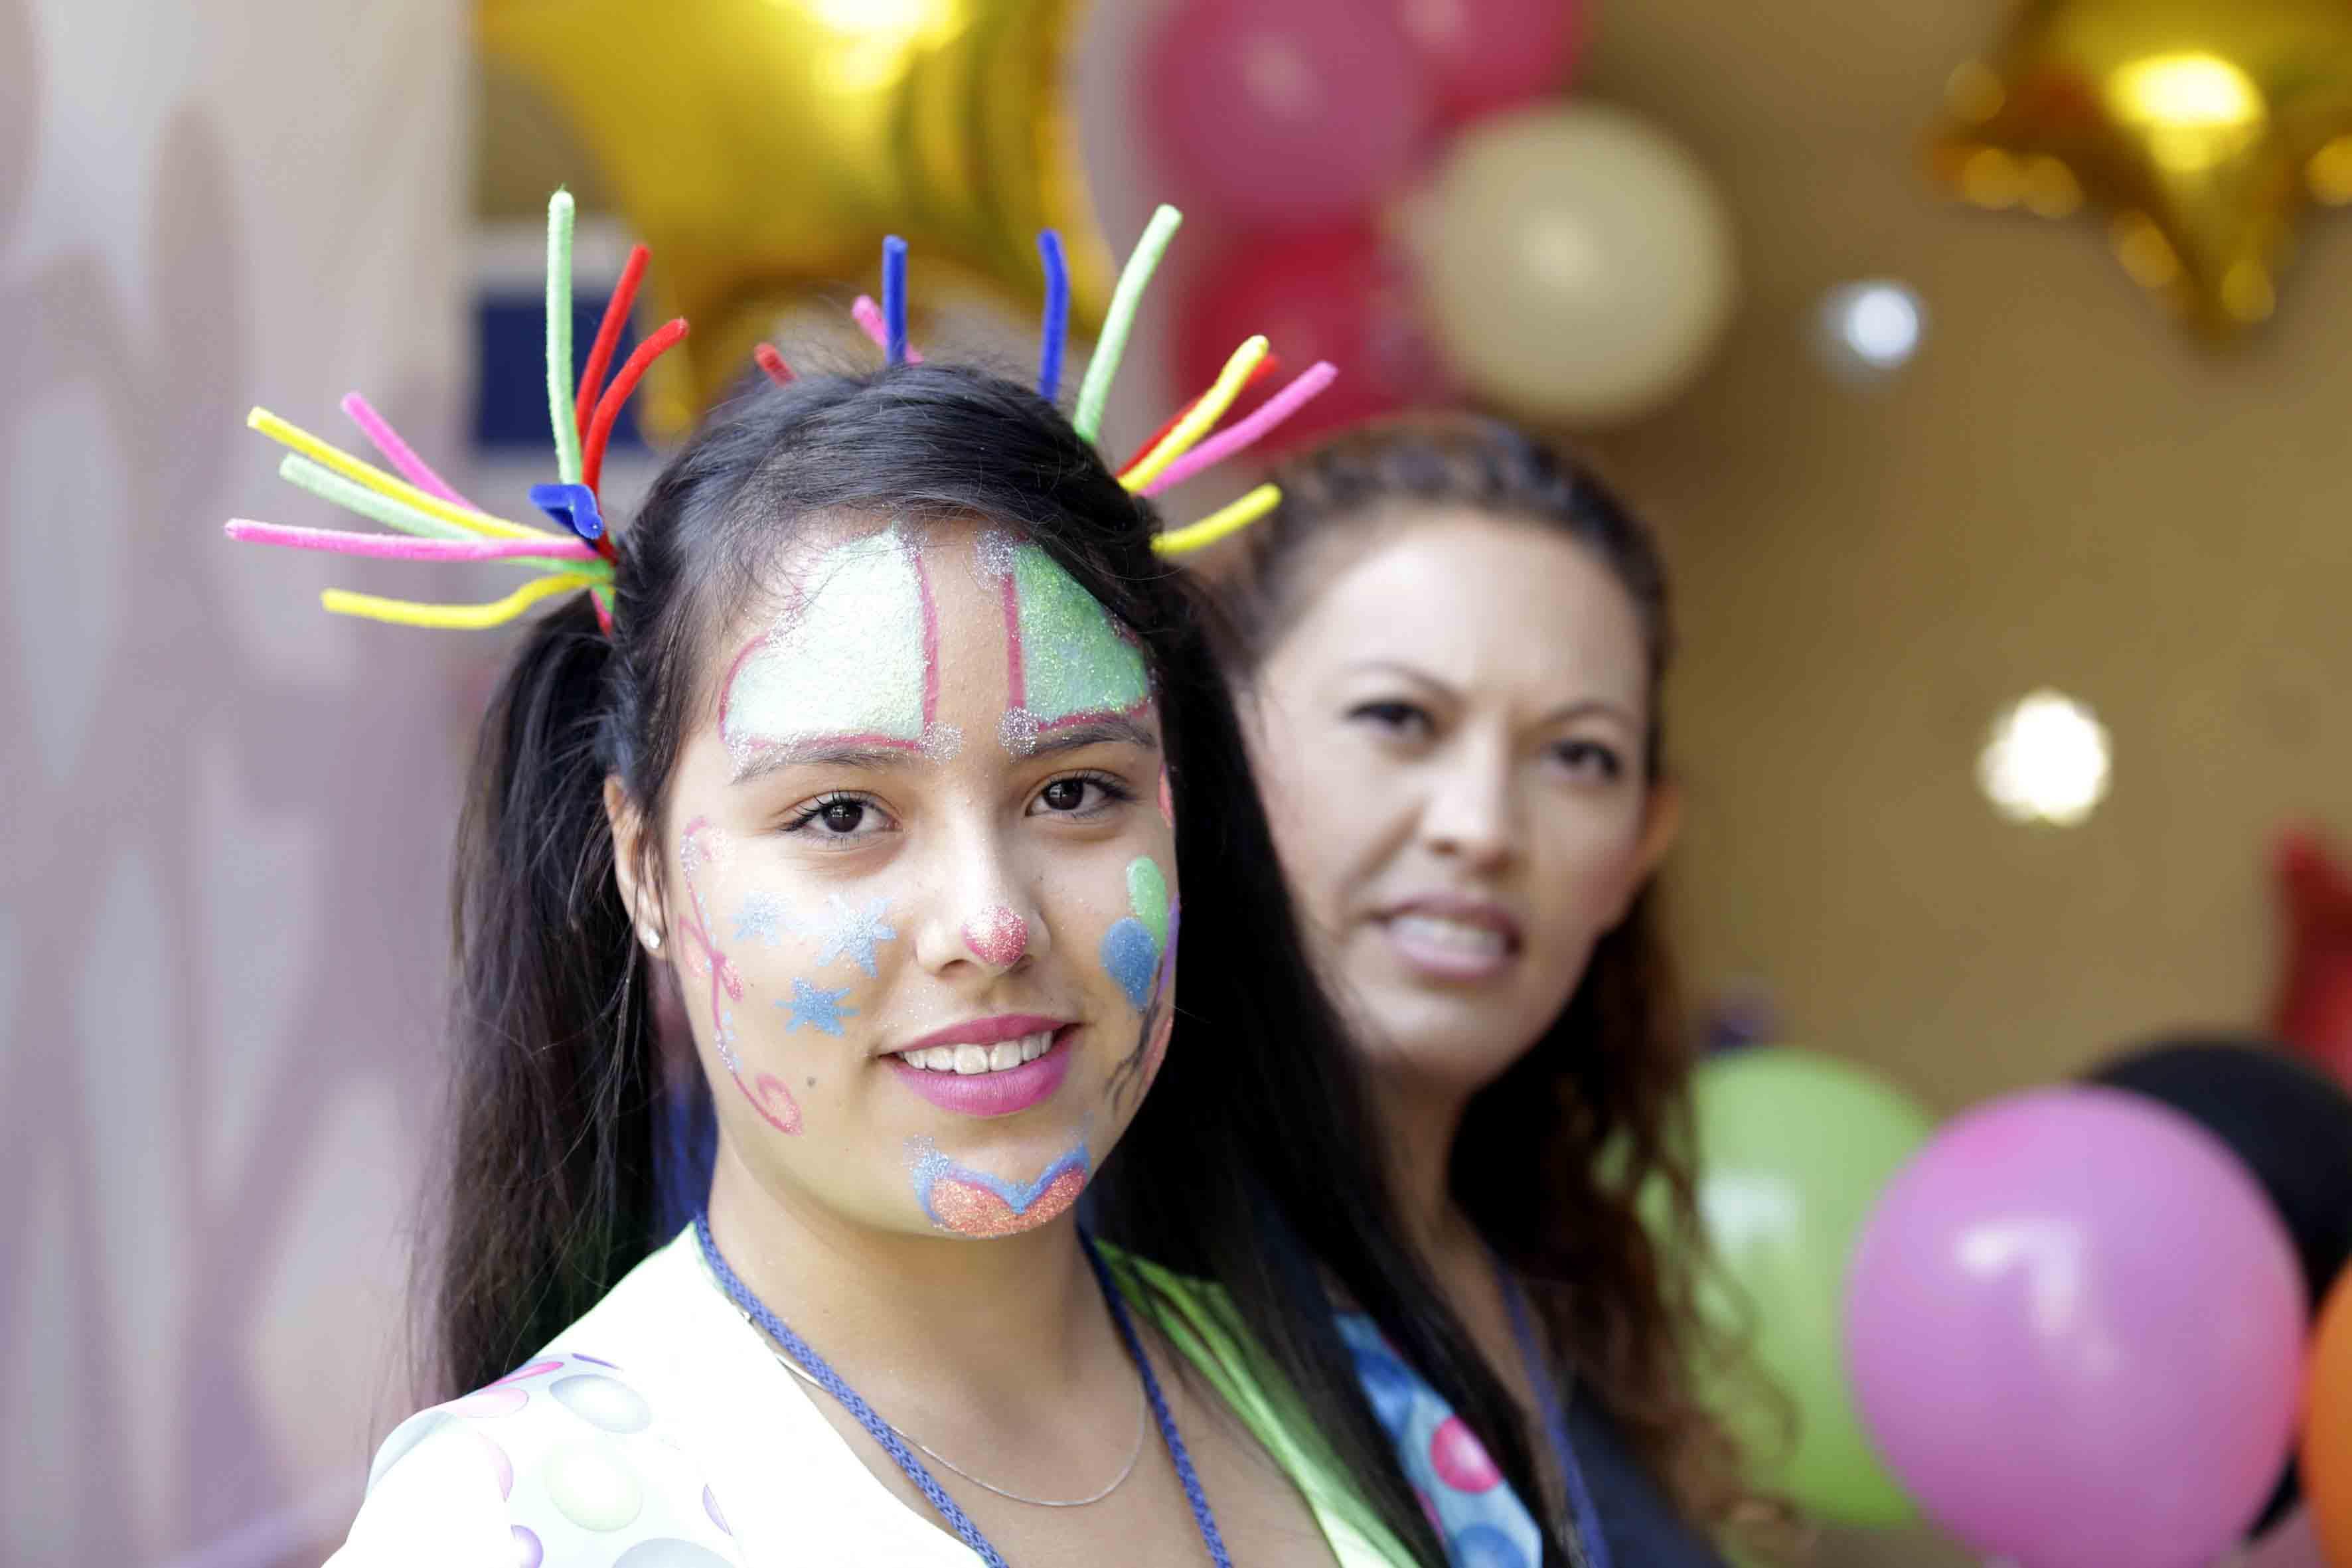 Joven con cara pintada participando en la expo